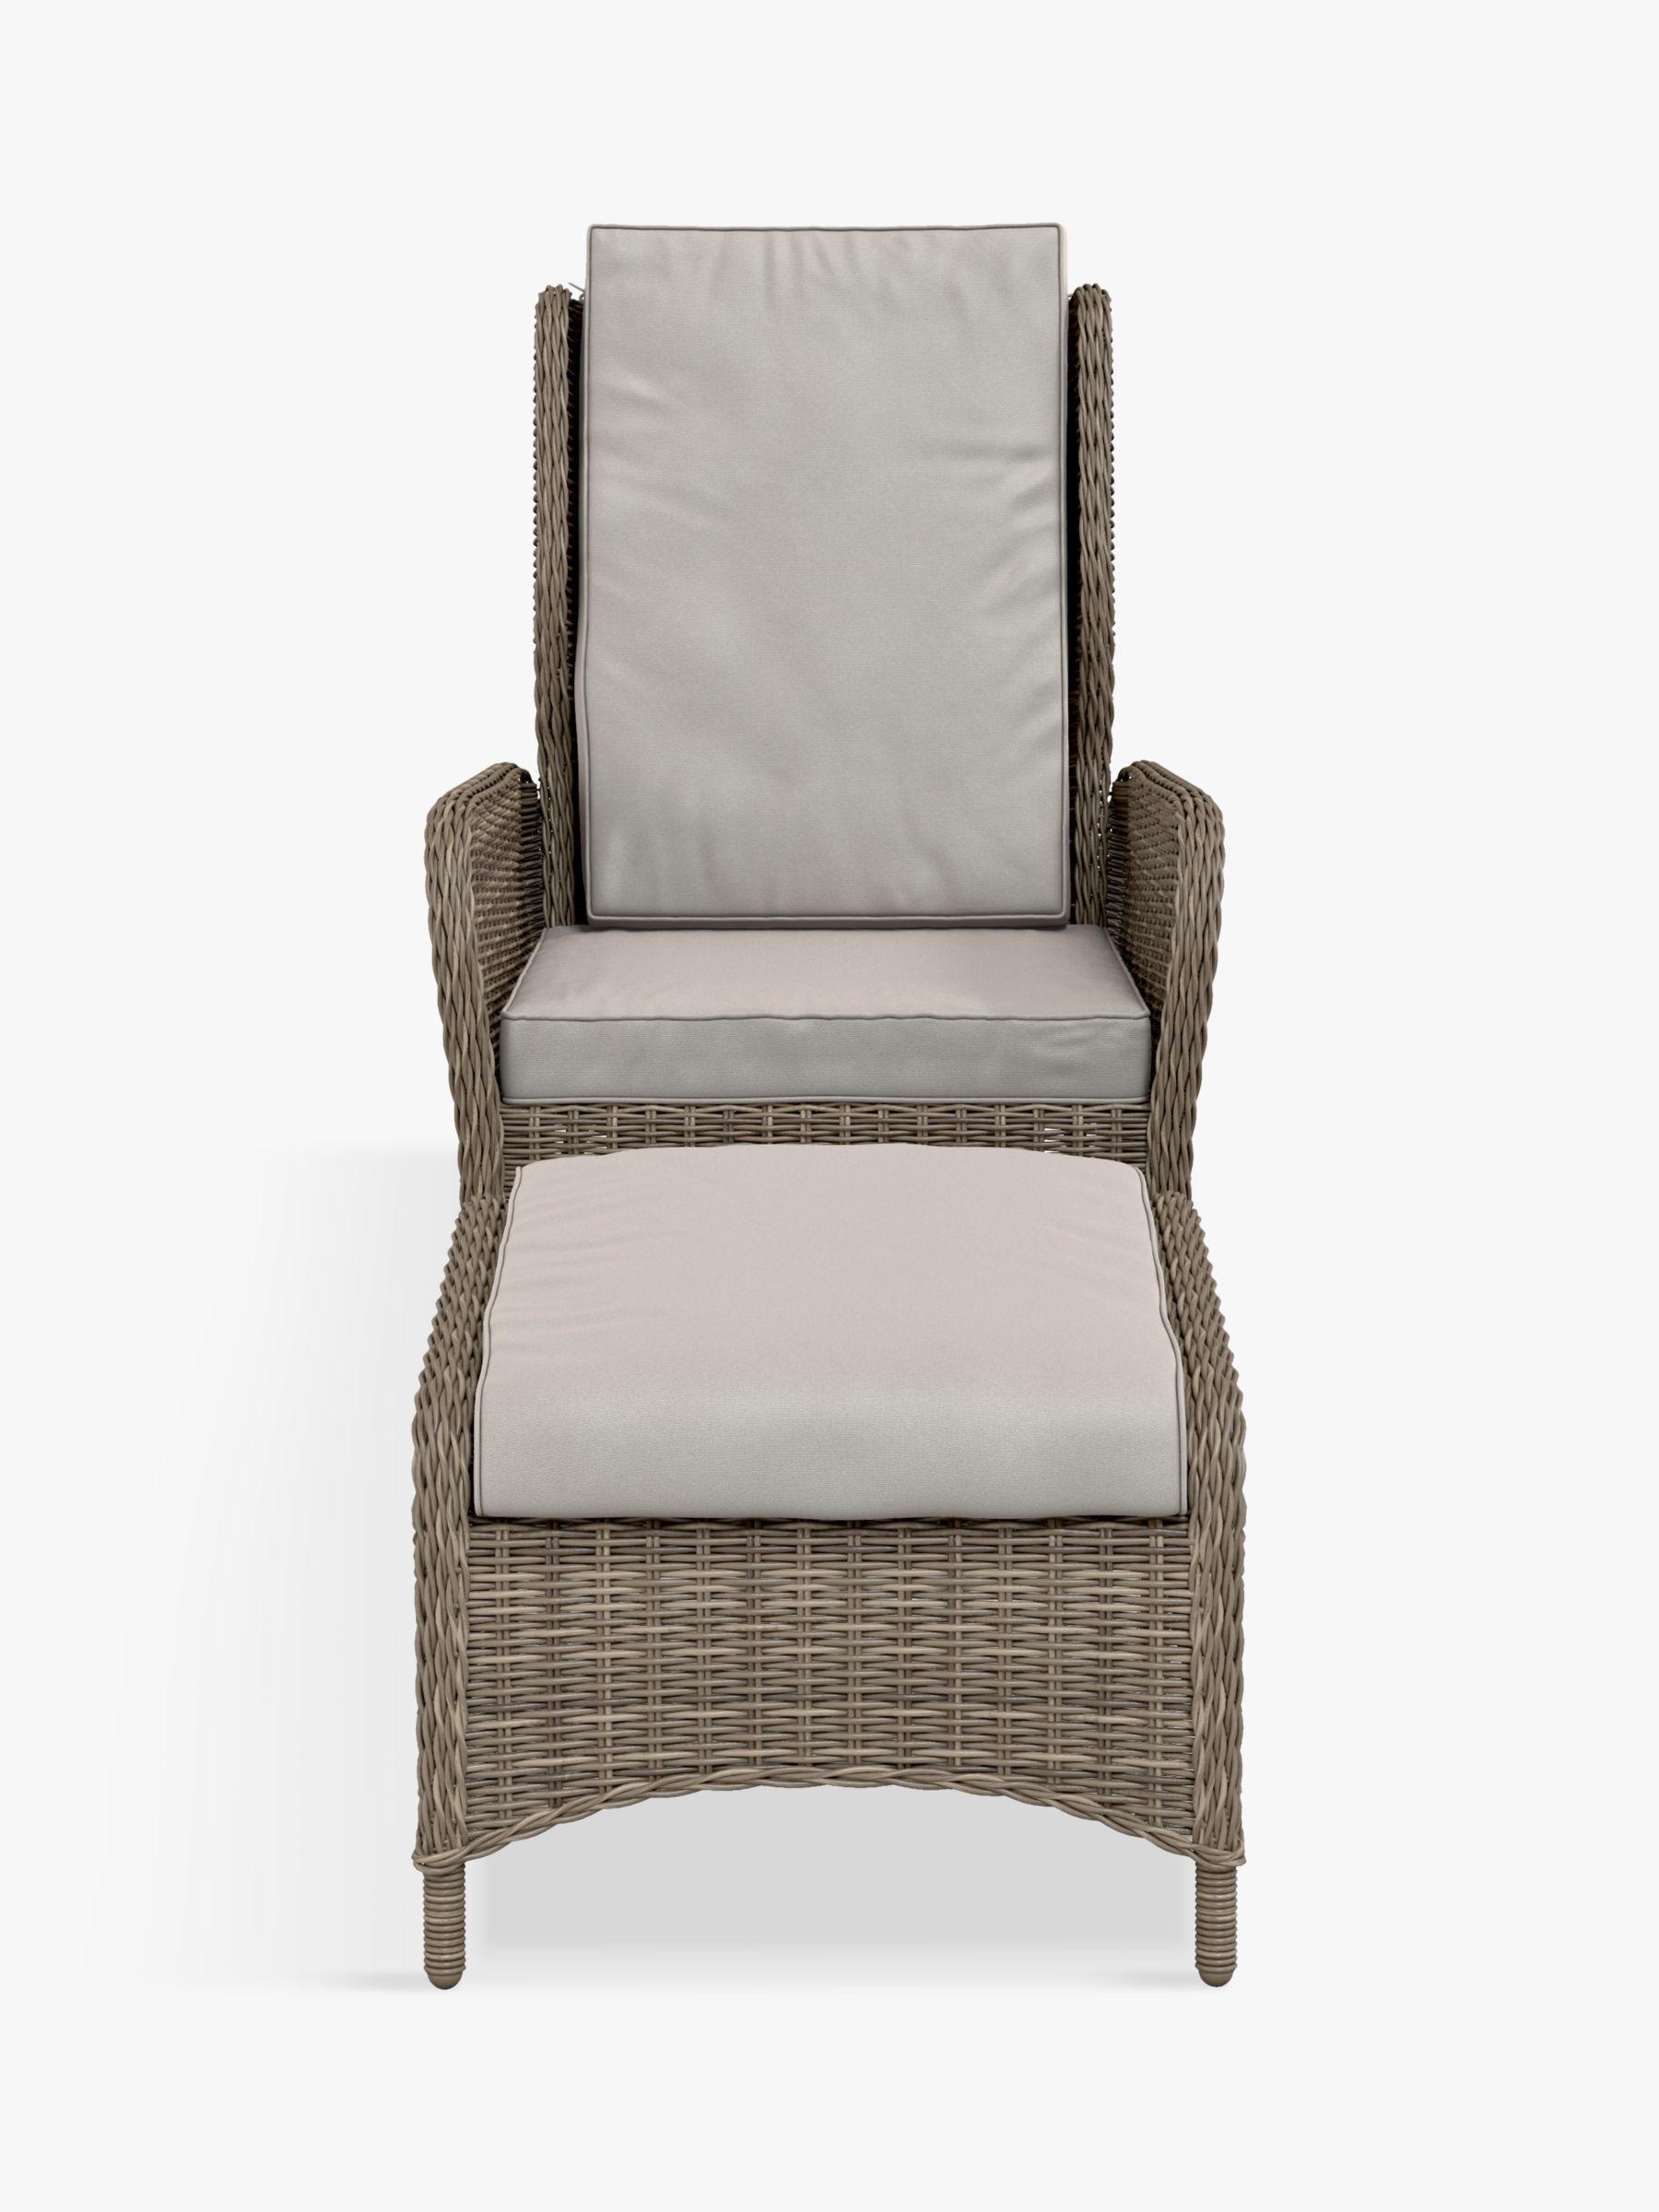 John Lewis & Partners Rye Garden Recliner Chair & Footstool, Set of 2, Natural